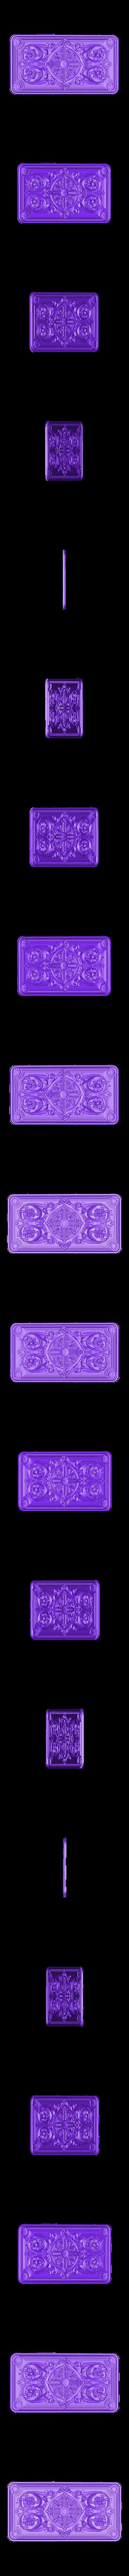 vstavka.stl Download free STL file cnc renaissance decoration art • Object to 3D print, STLmodelforfree